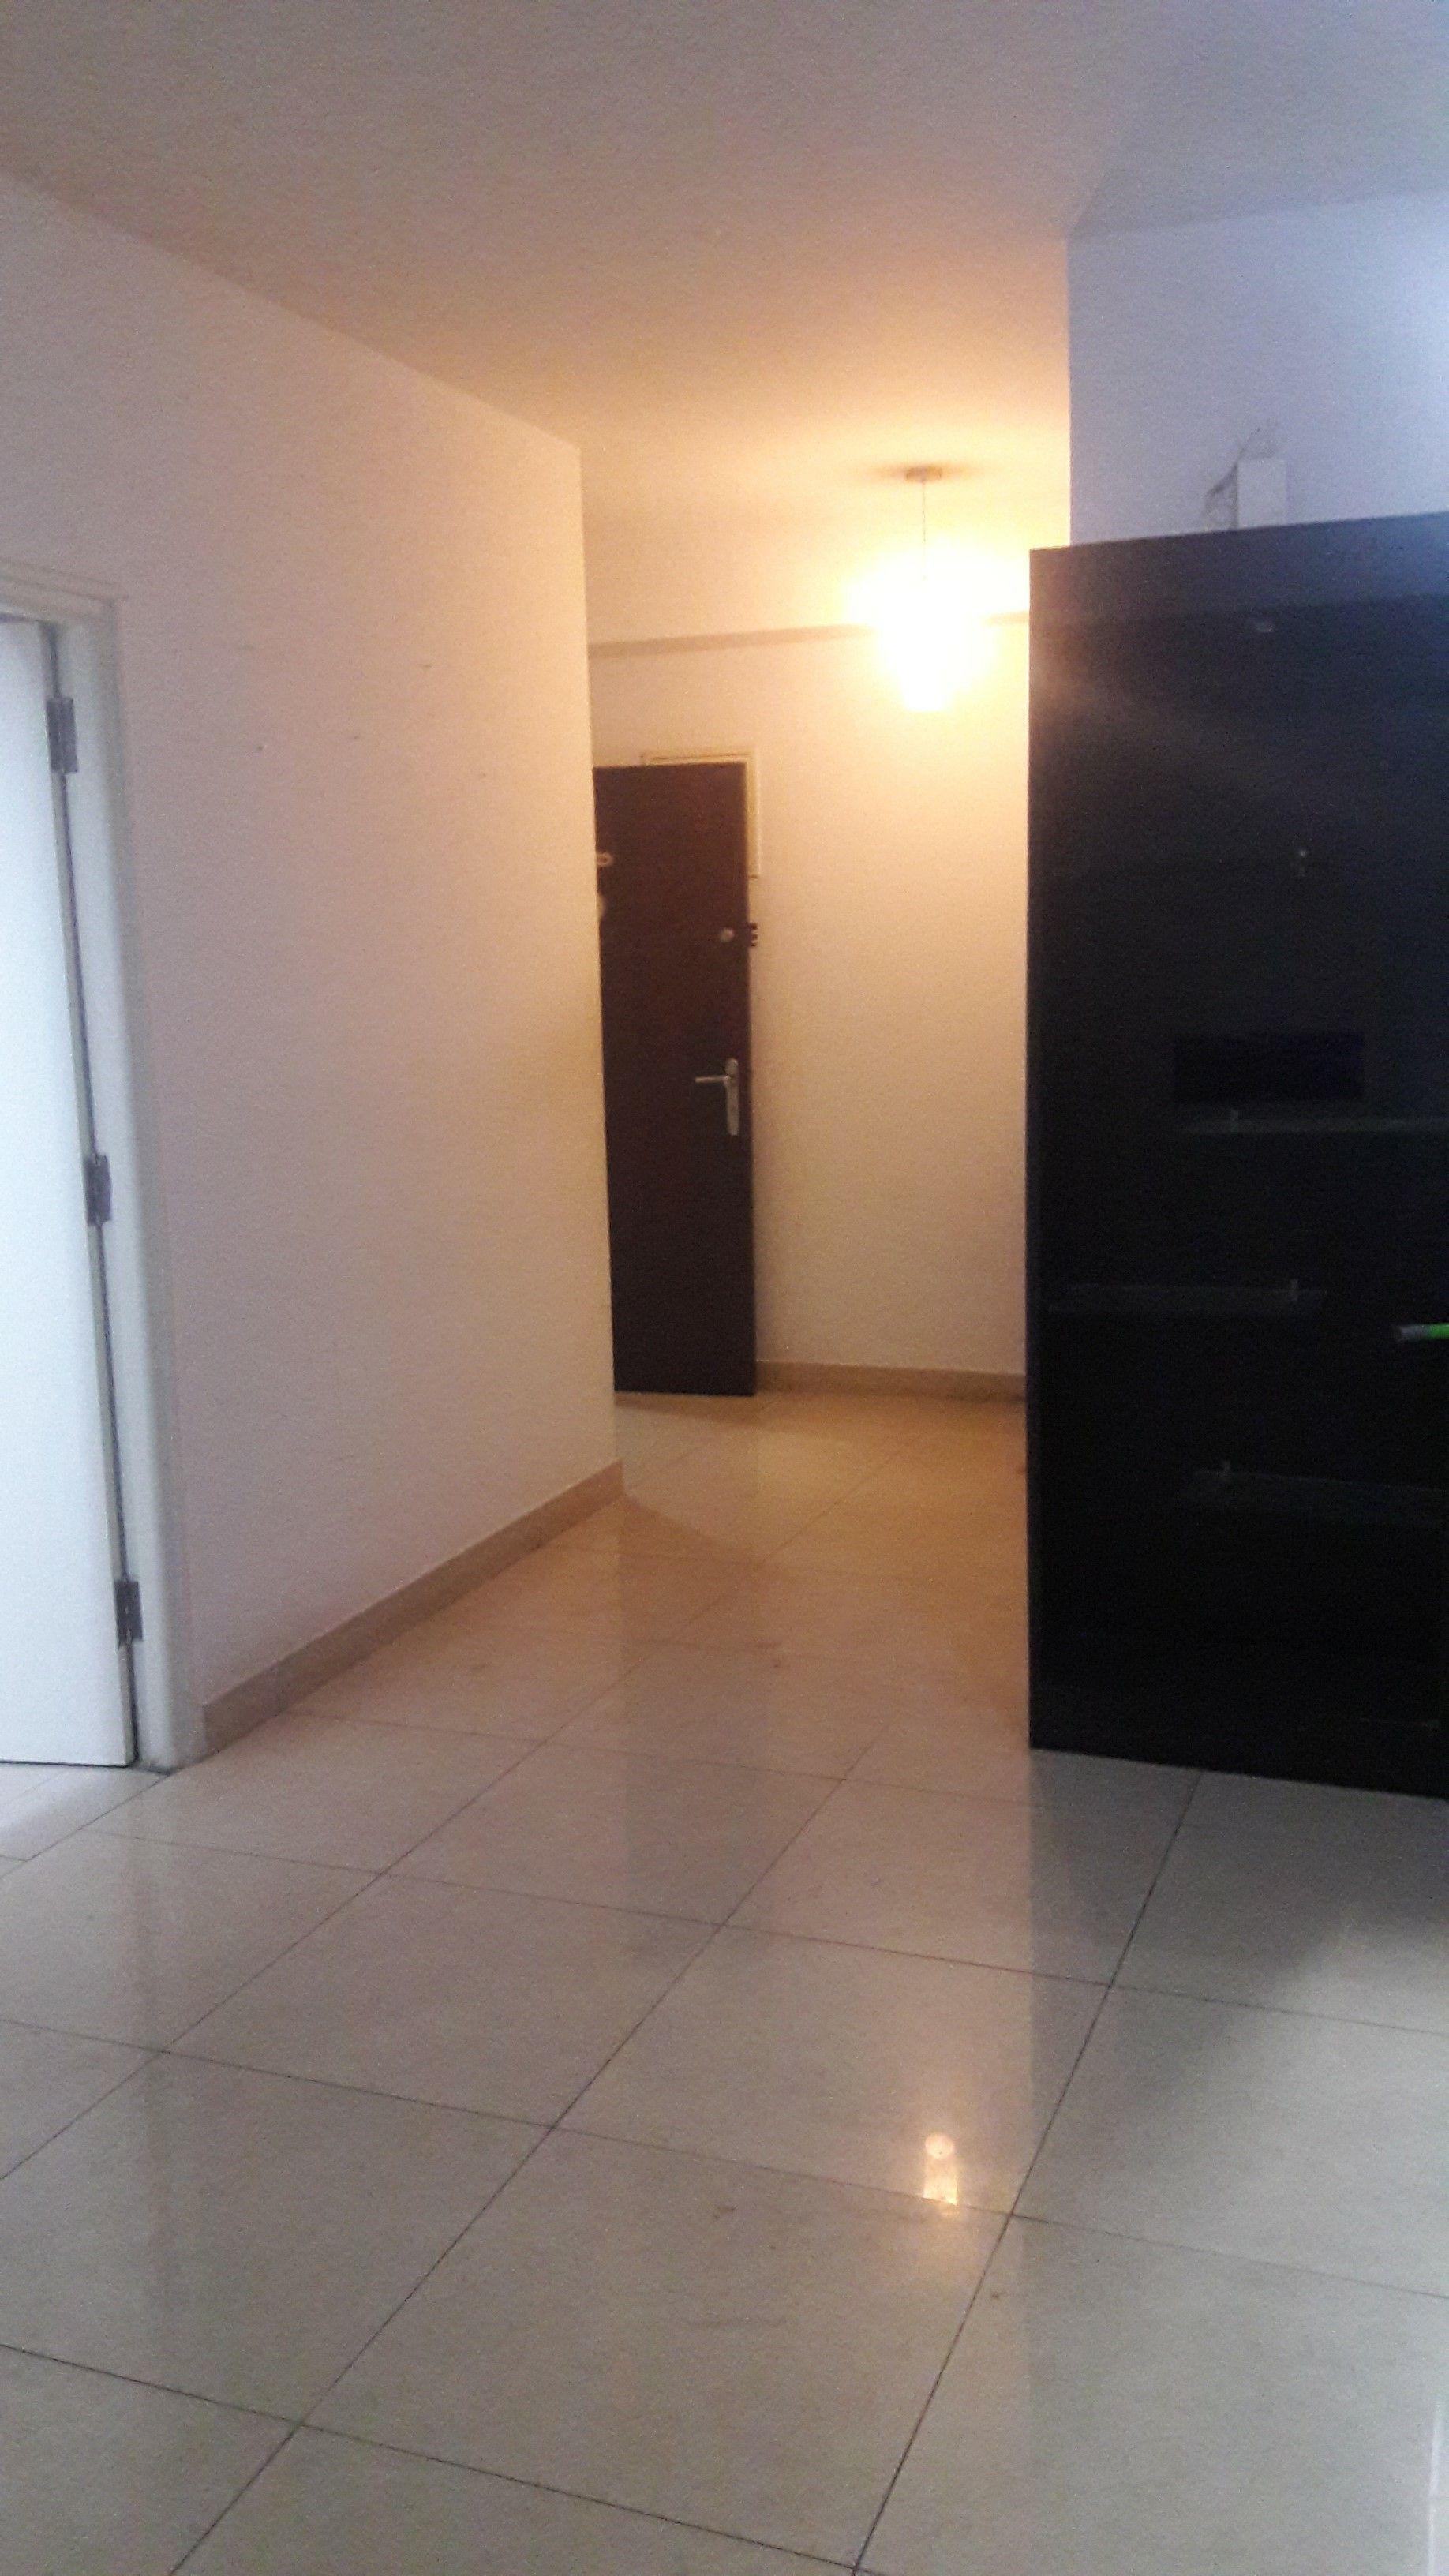 Elita Promenade, AssetC Property Management, 3 Bed 1690 Sqft Apartment For  Rent, J P